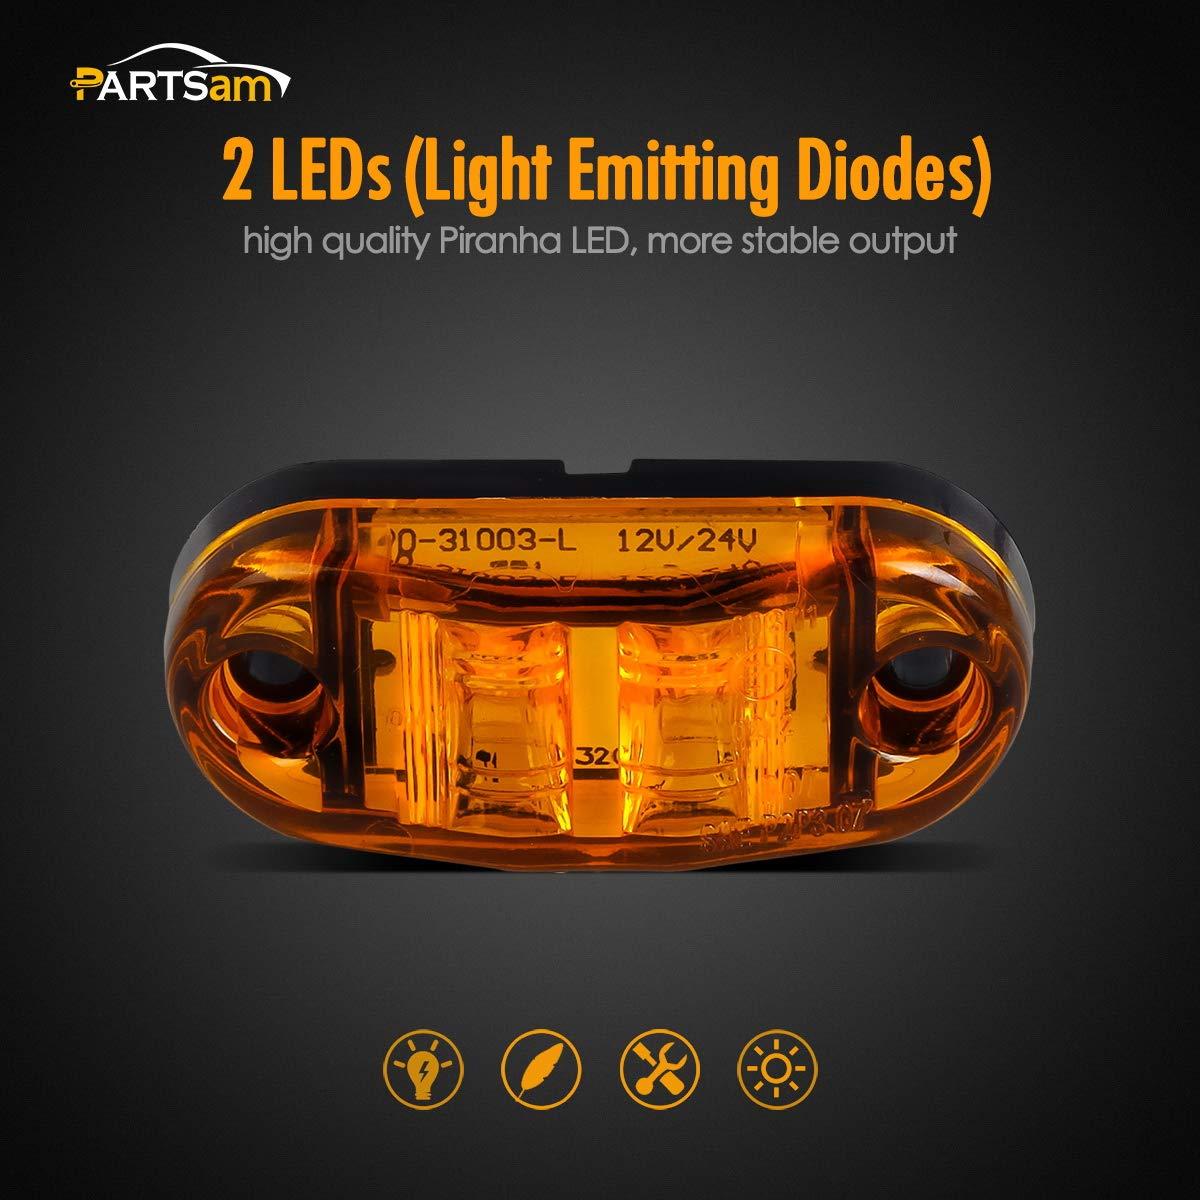 Amber Red 2.5 2 Diode Oval LED Trailer Truck Clearance Light Side Marker Light 4PCS Surface Mount Little Boat Marine Led Lights RV Camper Accessories